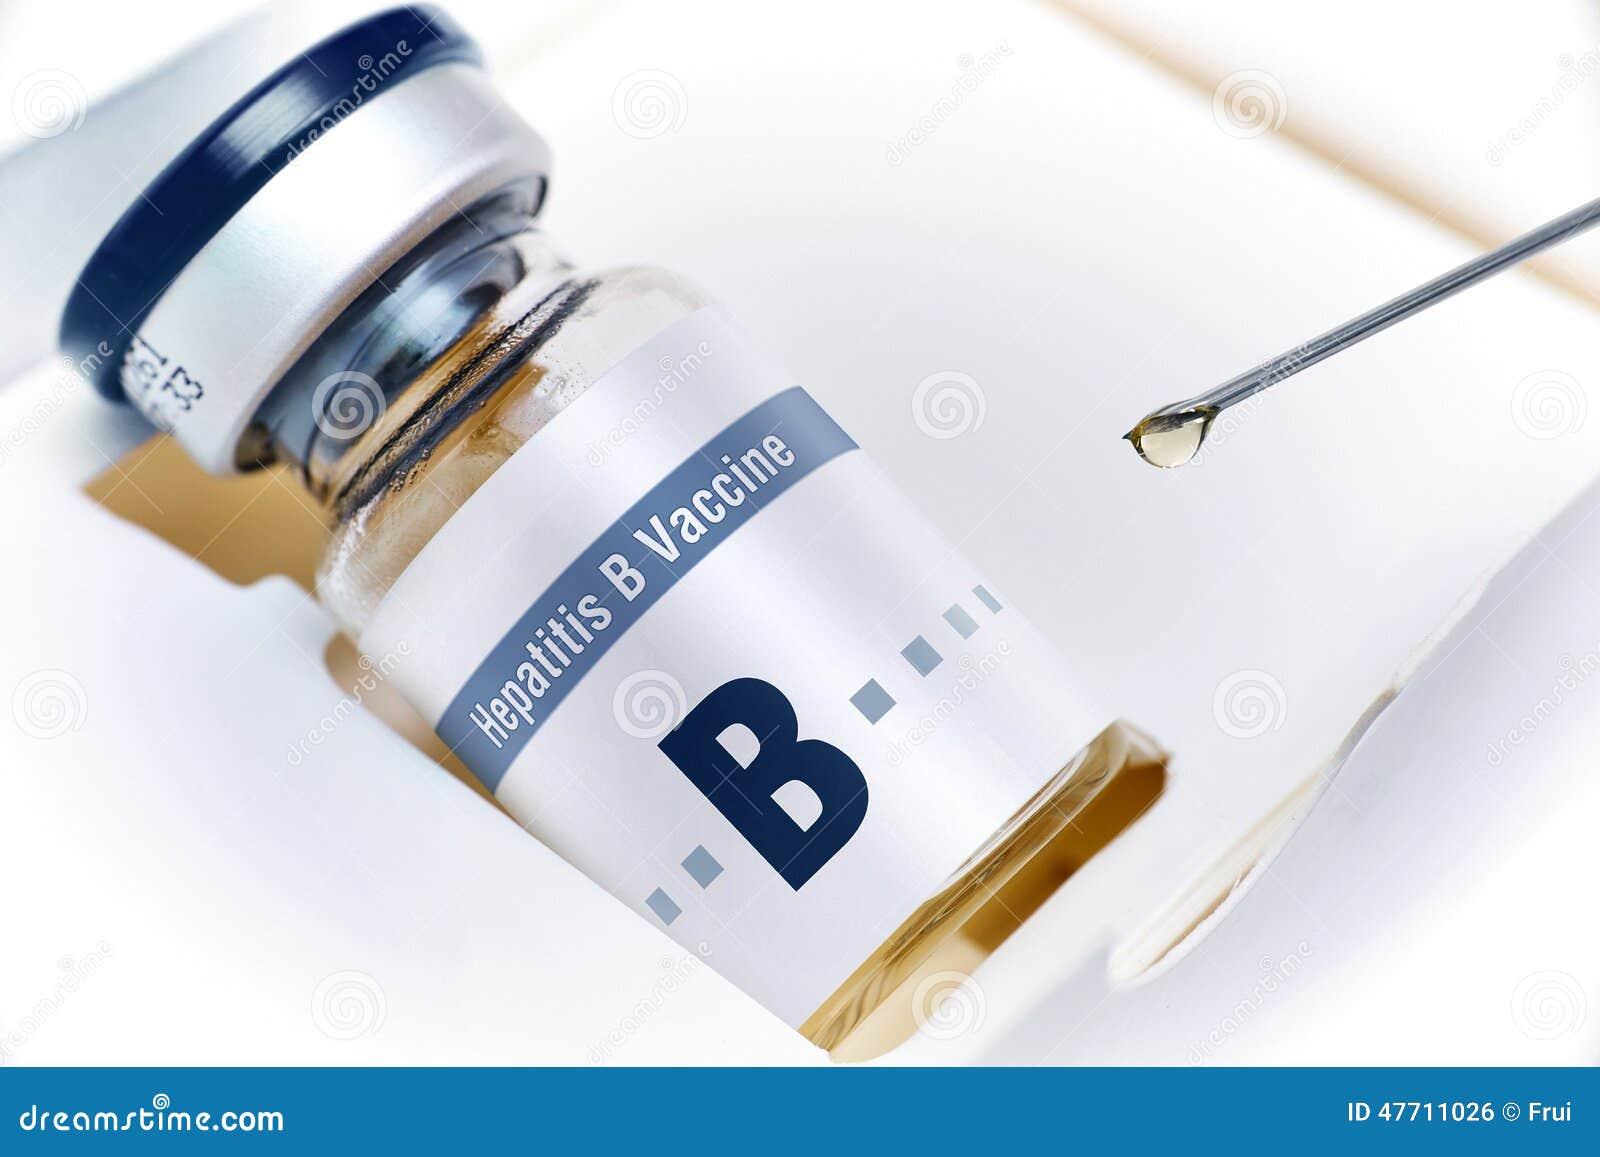 hepatitis b vaccine hbv stock photo image of health 47711026 vaccine clipart image vaccine clipart image